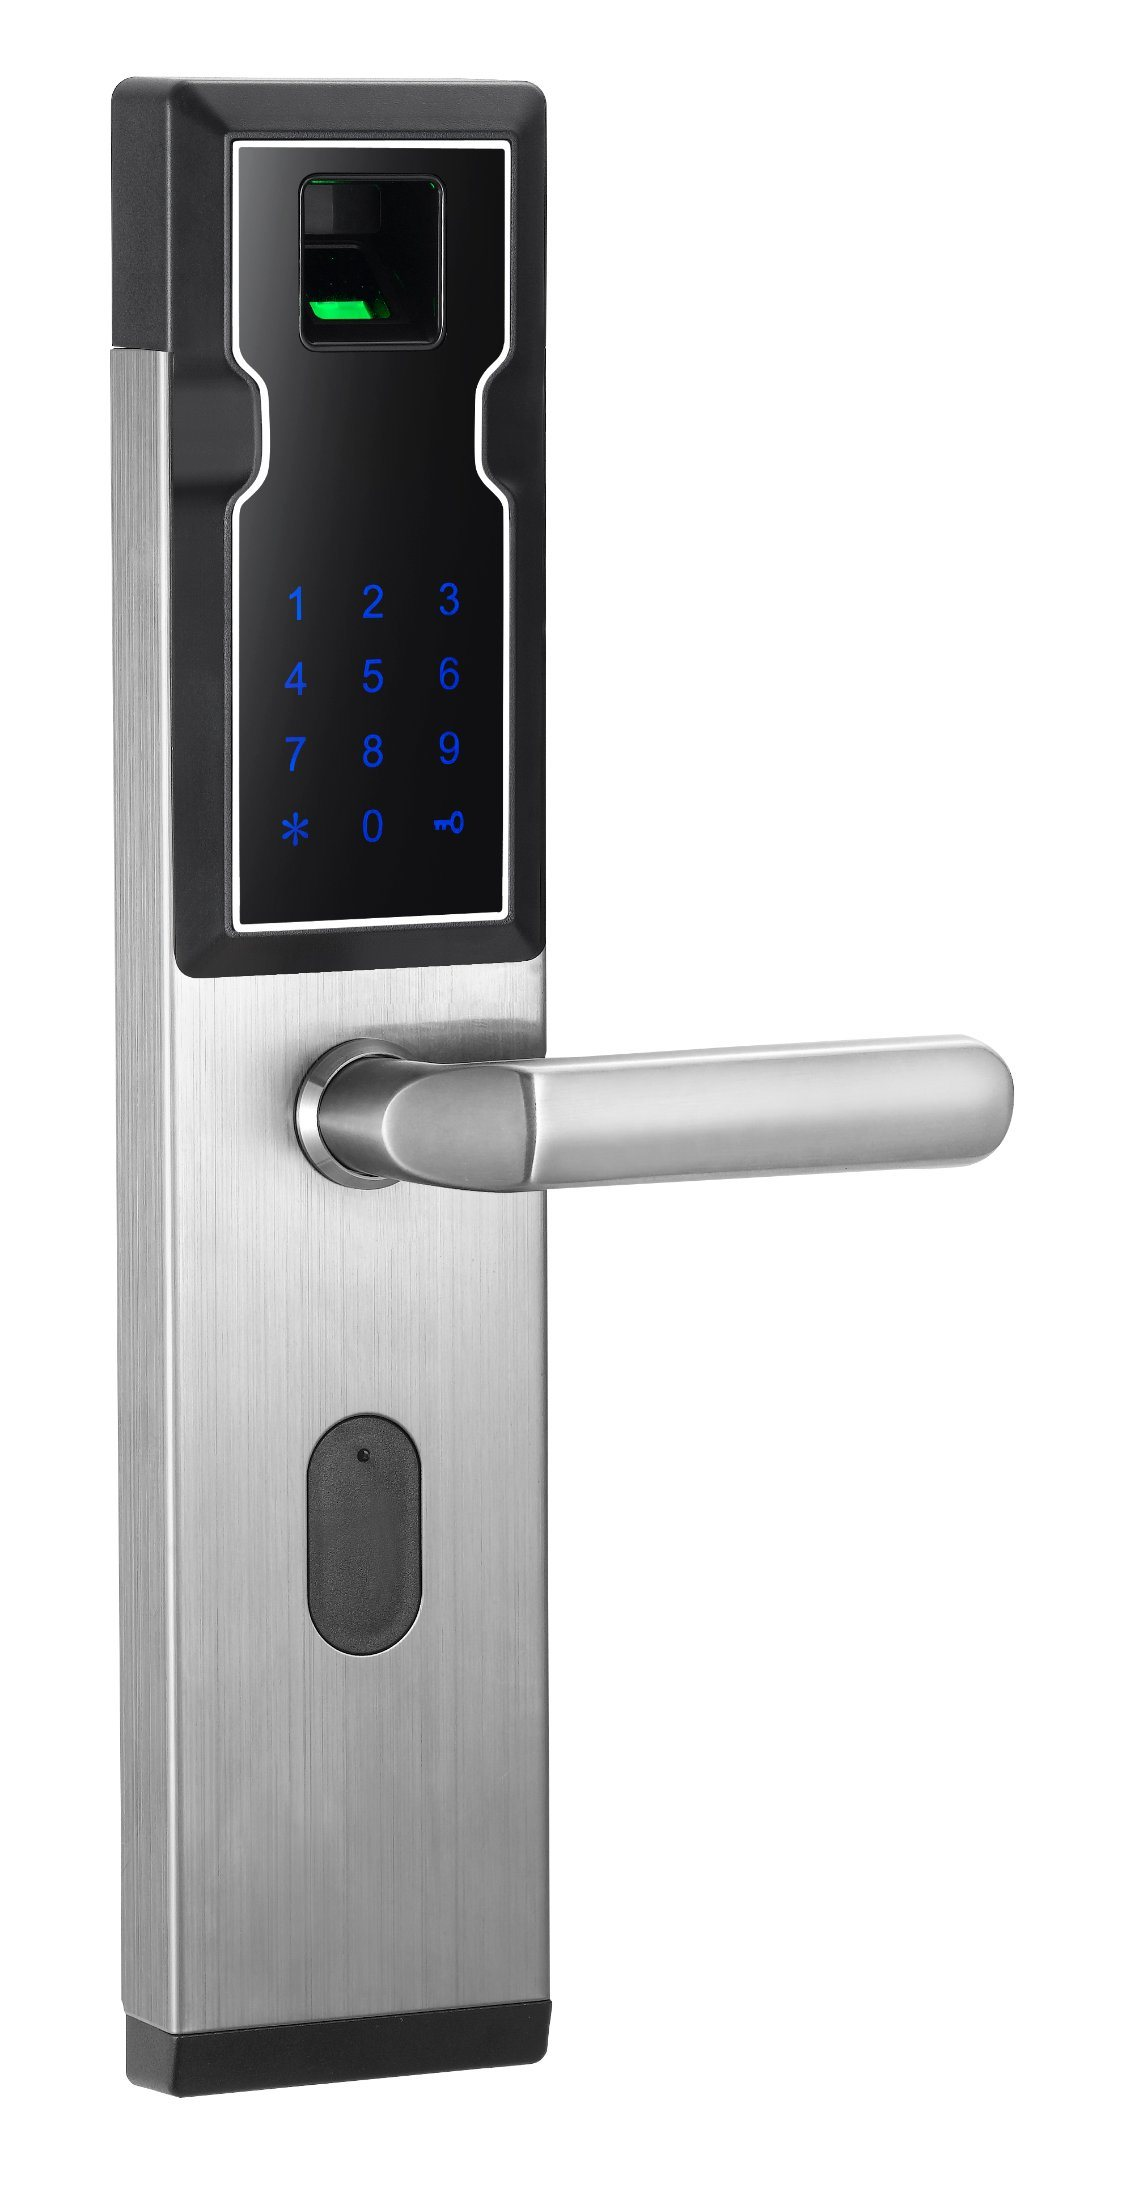 [Hot Item] High Security Fingerprint Keypad Smart Door Lock Unlock with  Code, Card, Fingerprint and Key